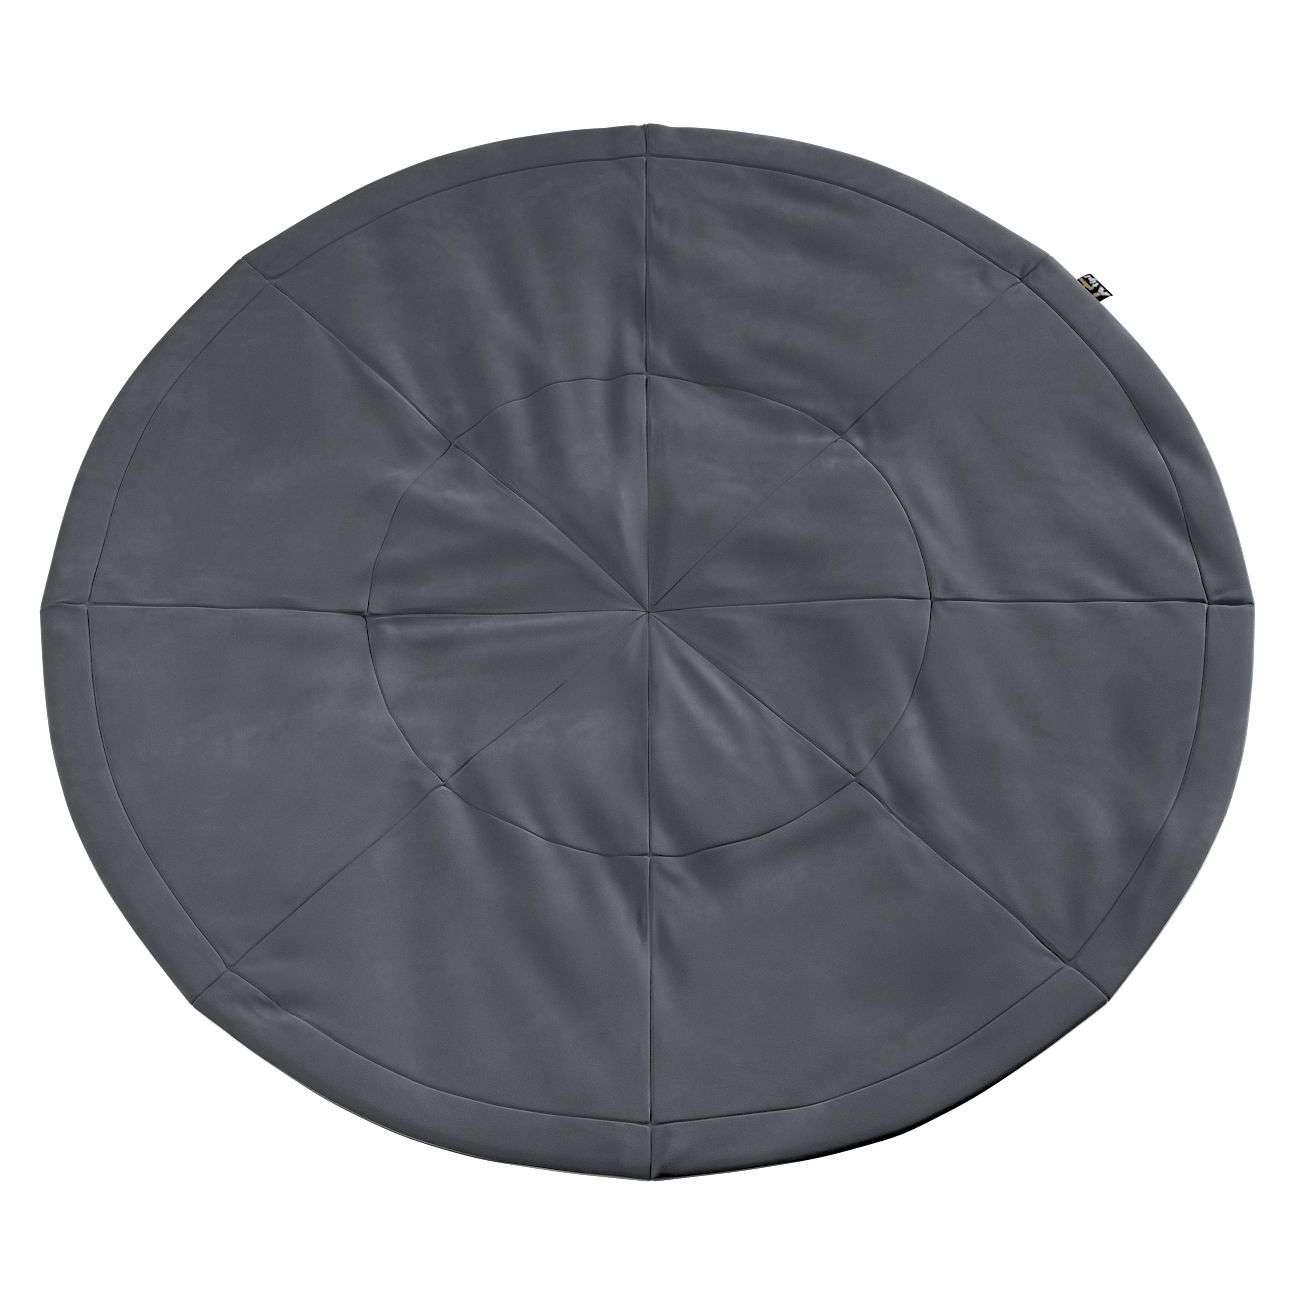 Mata okrągła śr. 130cm 704-12 + 704-10